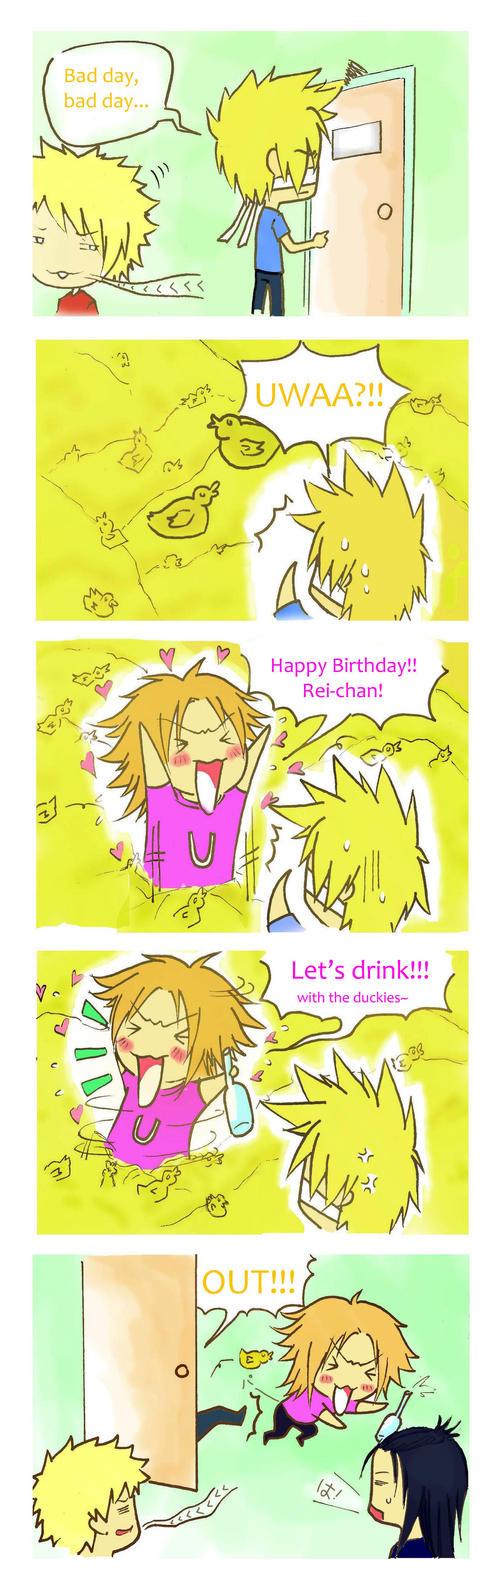 Reita's Birthday - Uru Ver by wasabiyuu